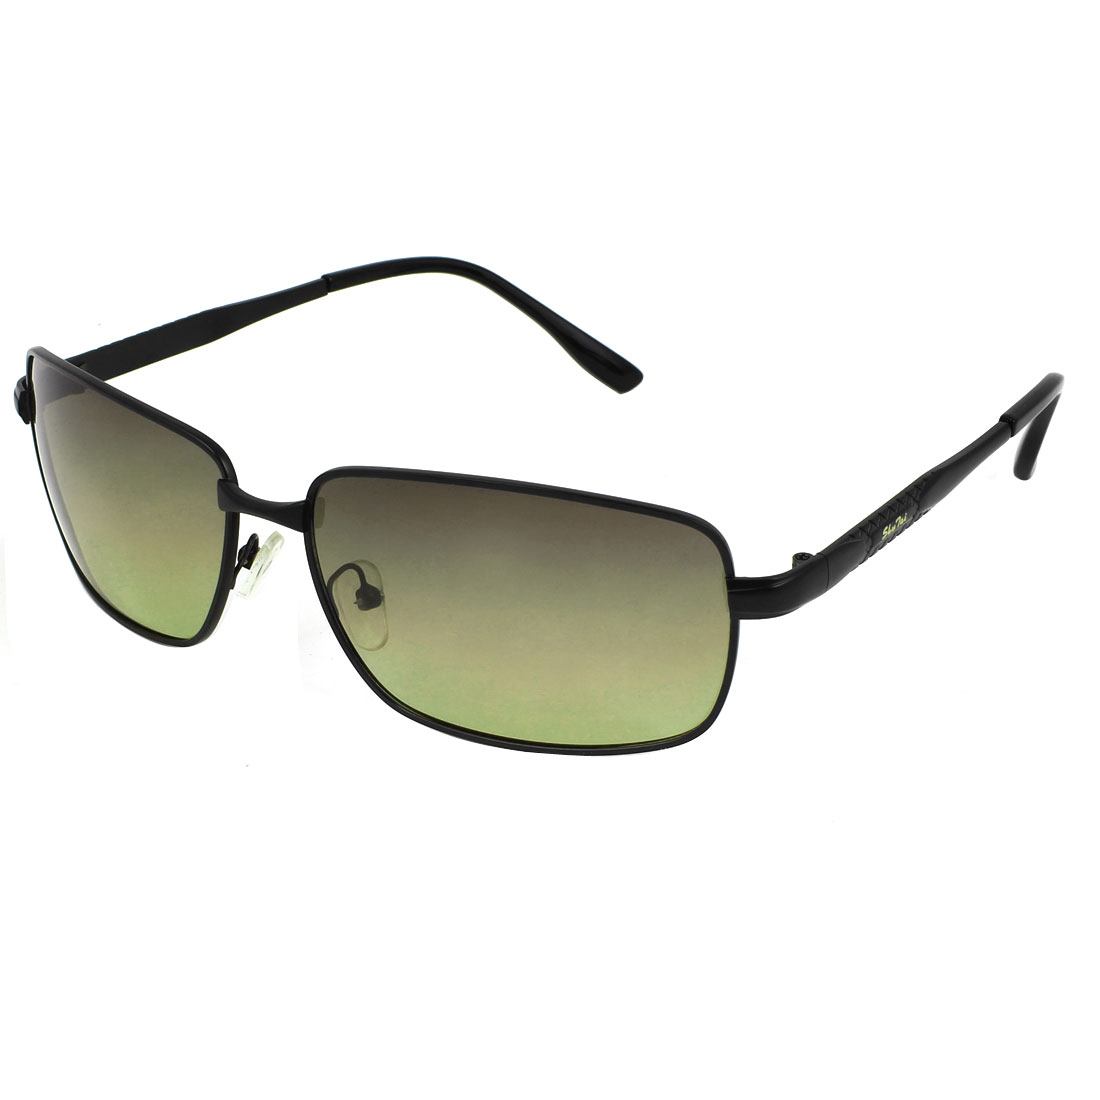 Slim Arm Black Frame Single Bridge Polarized Sunglasses Sun Glasses for Man